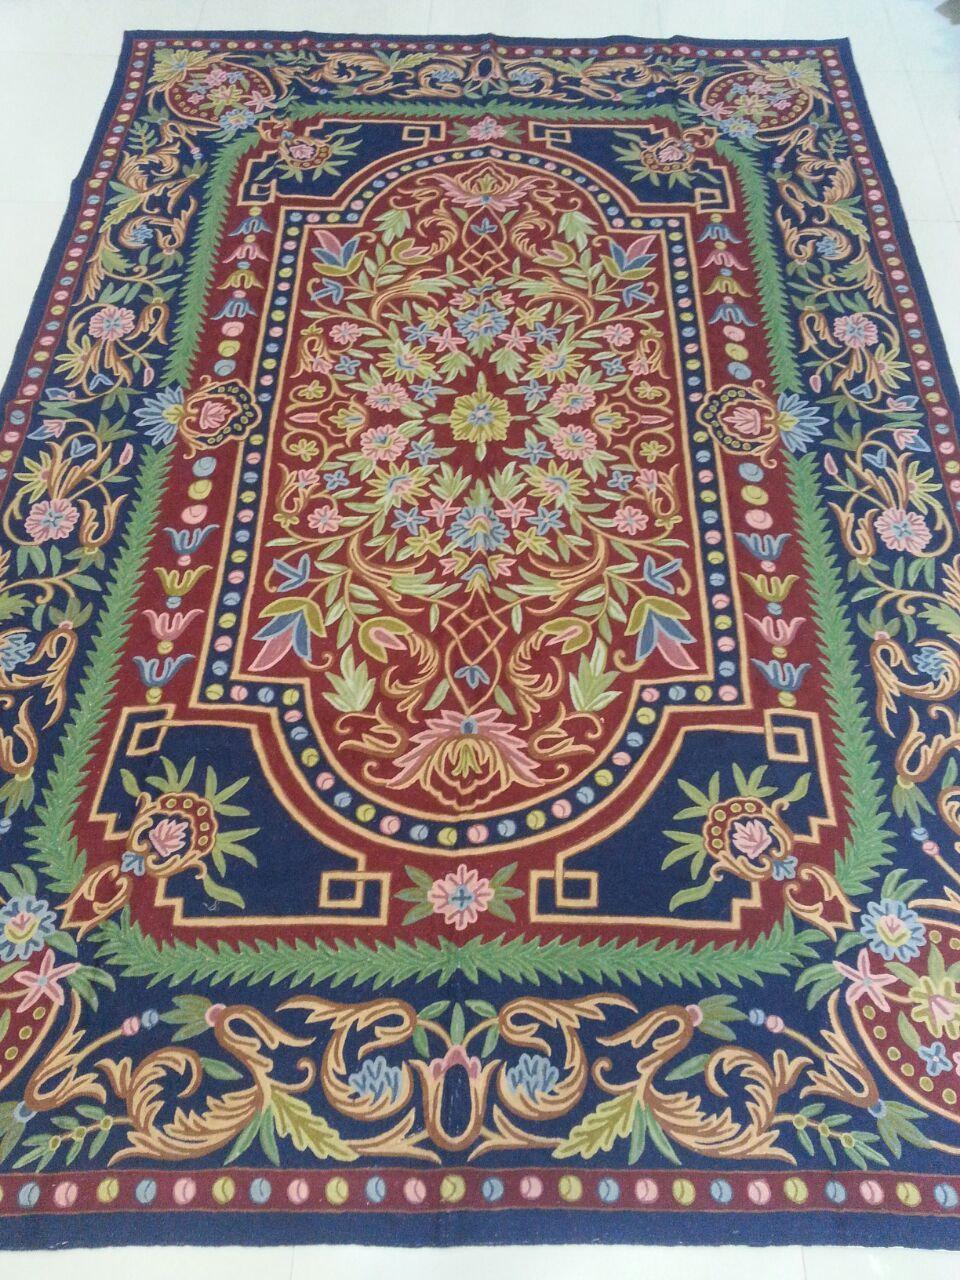 Blue Woollen Rugs Wall Hanging Tapestry Hallway Runner Décor Pastel